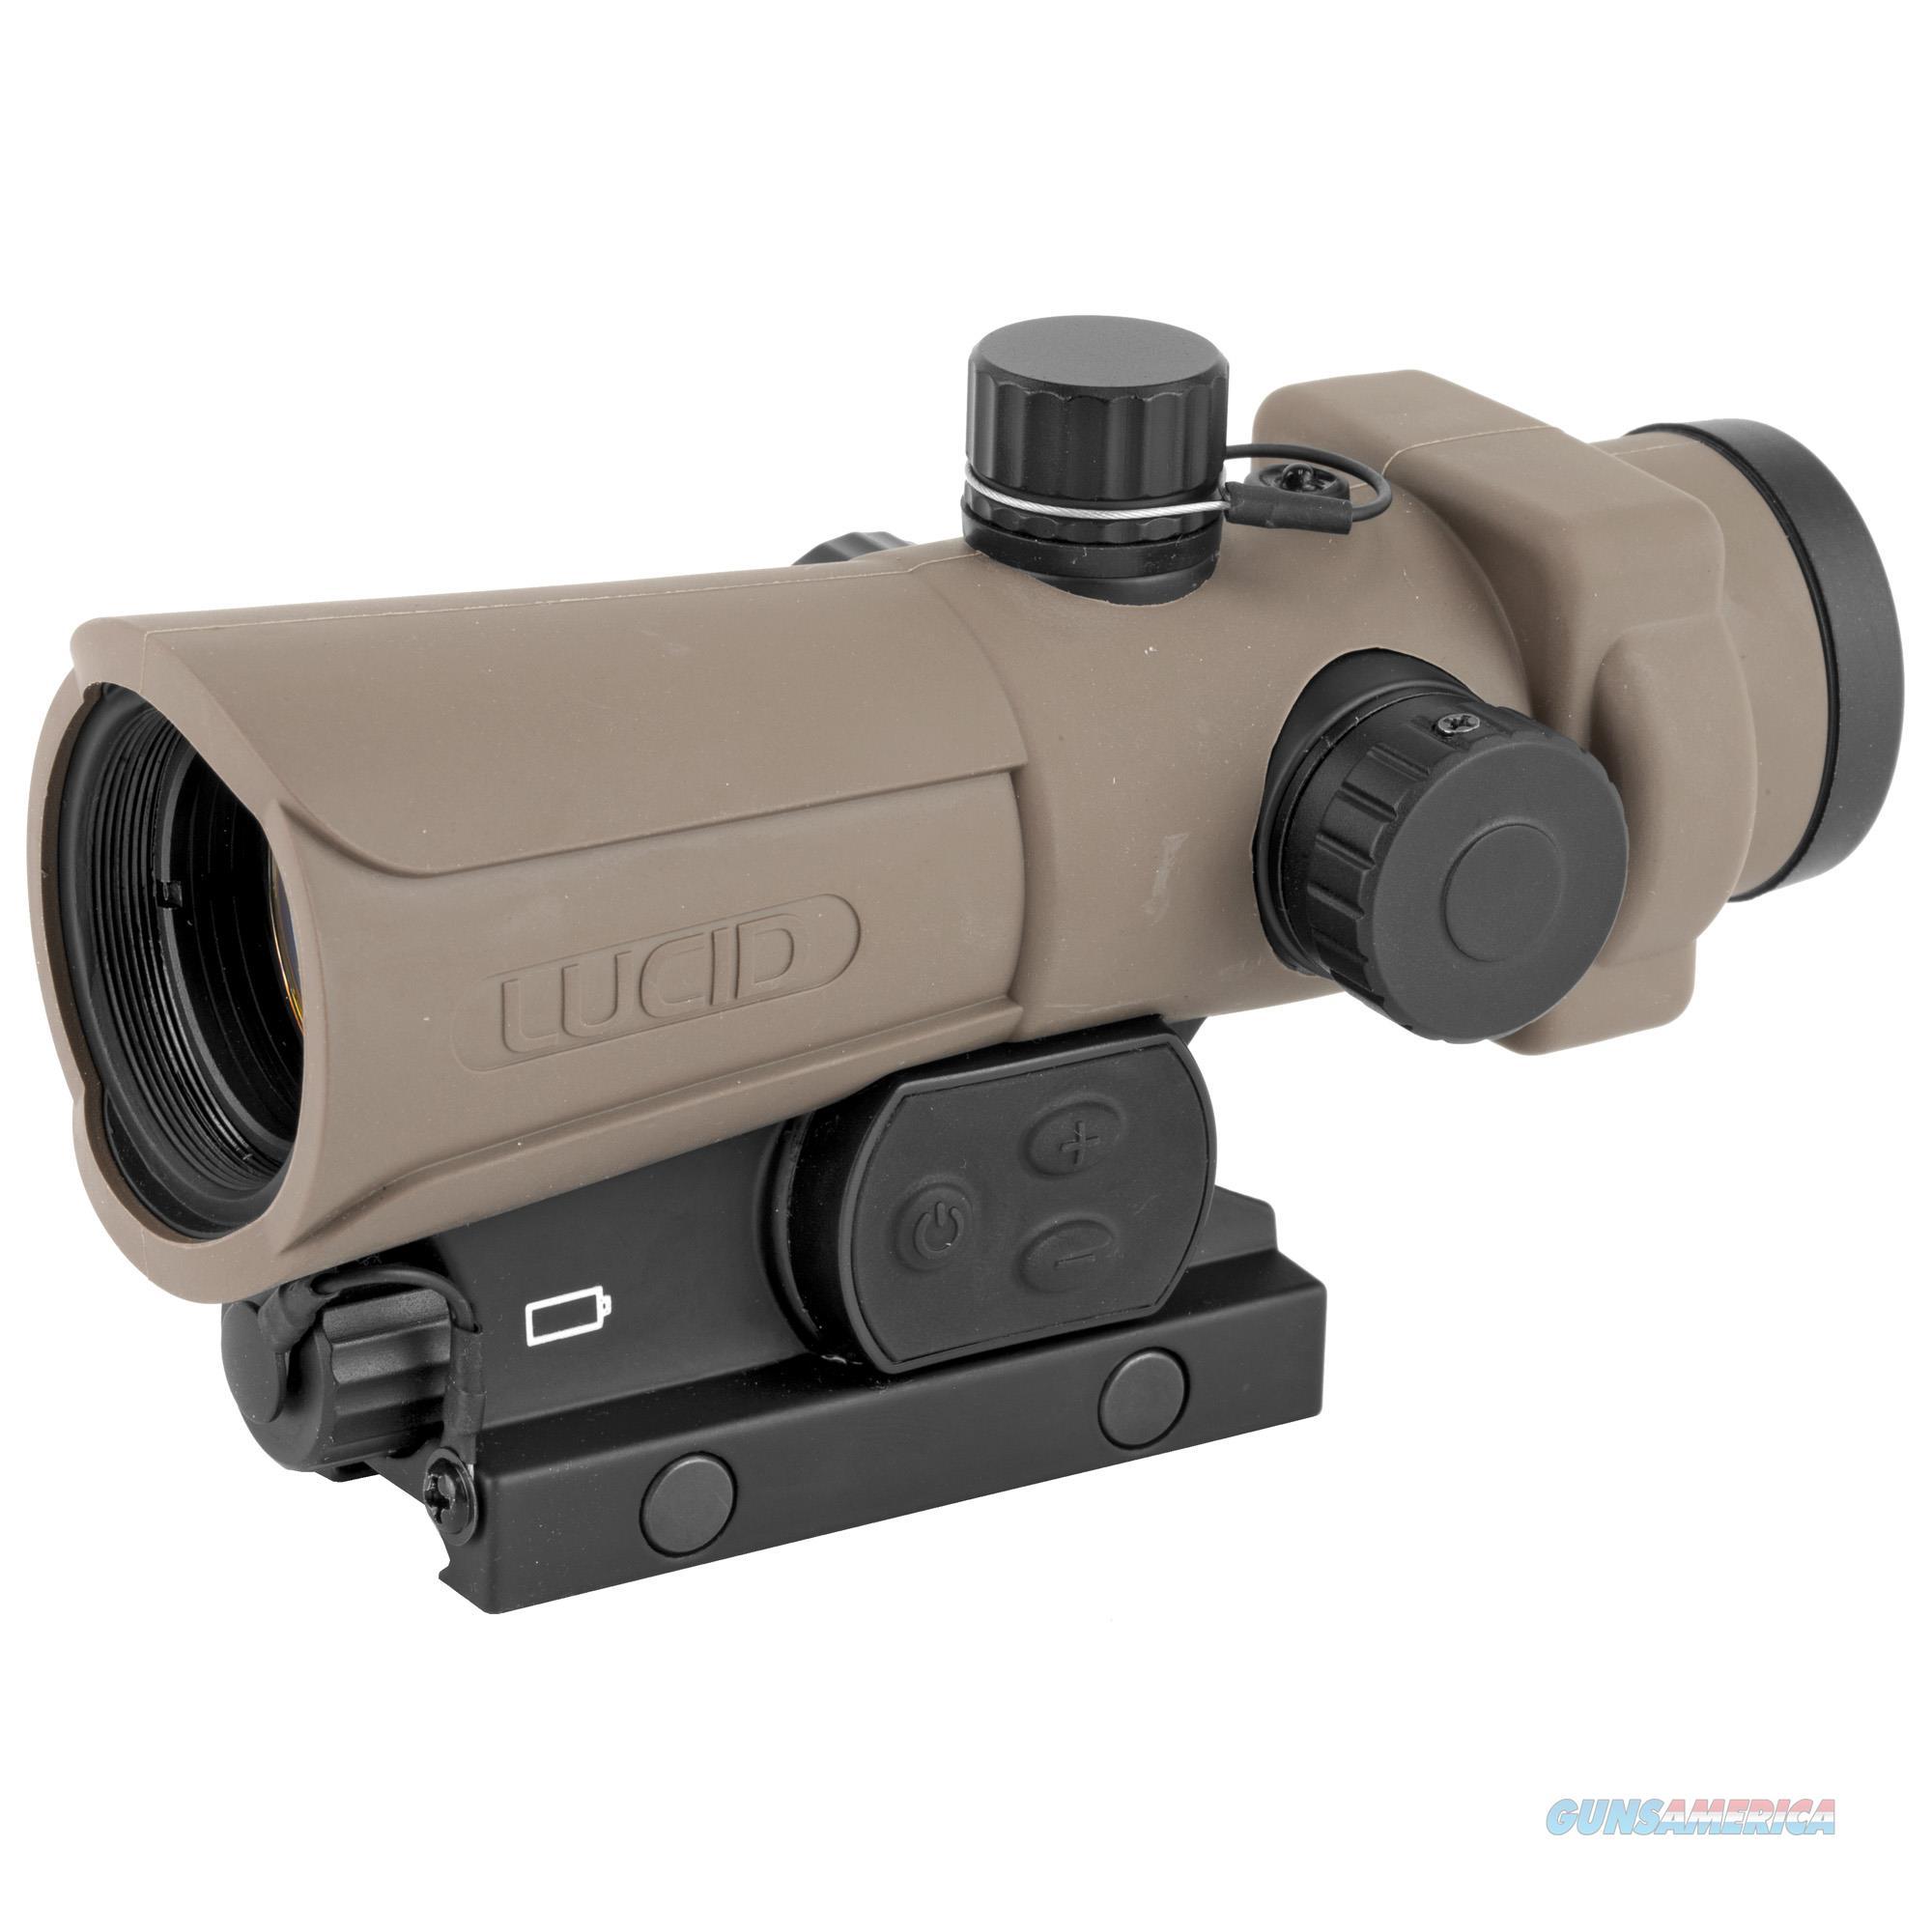 Lucid Optics Red Dot Hd7 - Gen3 34mm Tan  Guns > Pistols > 1911 Pistol Copies (non-Colt)